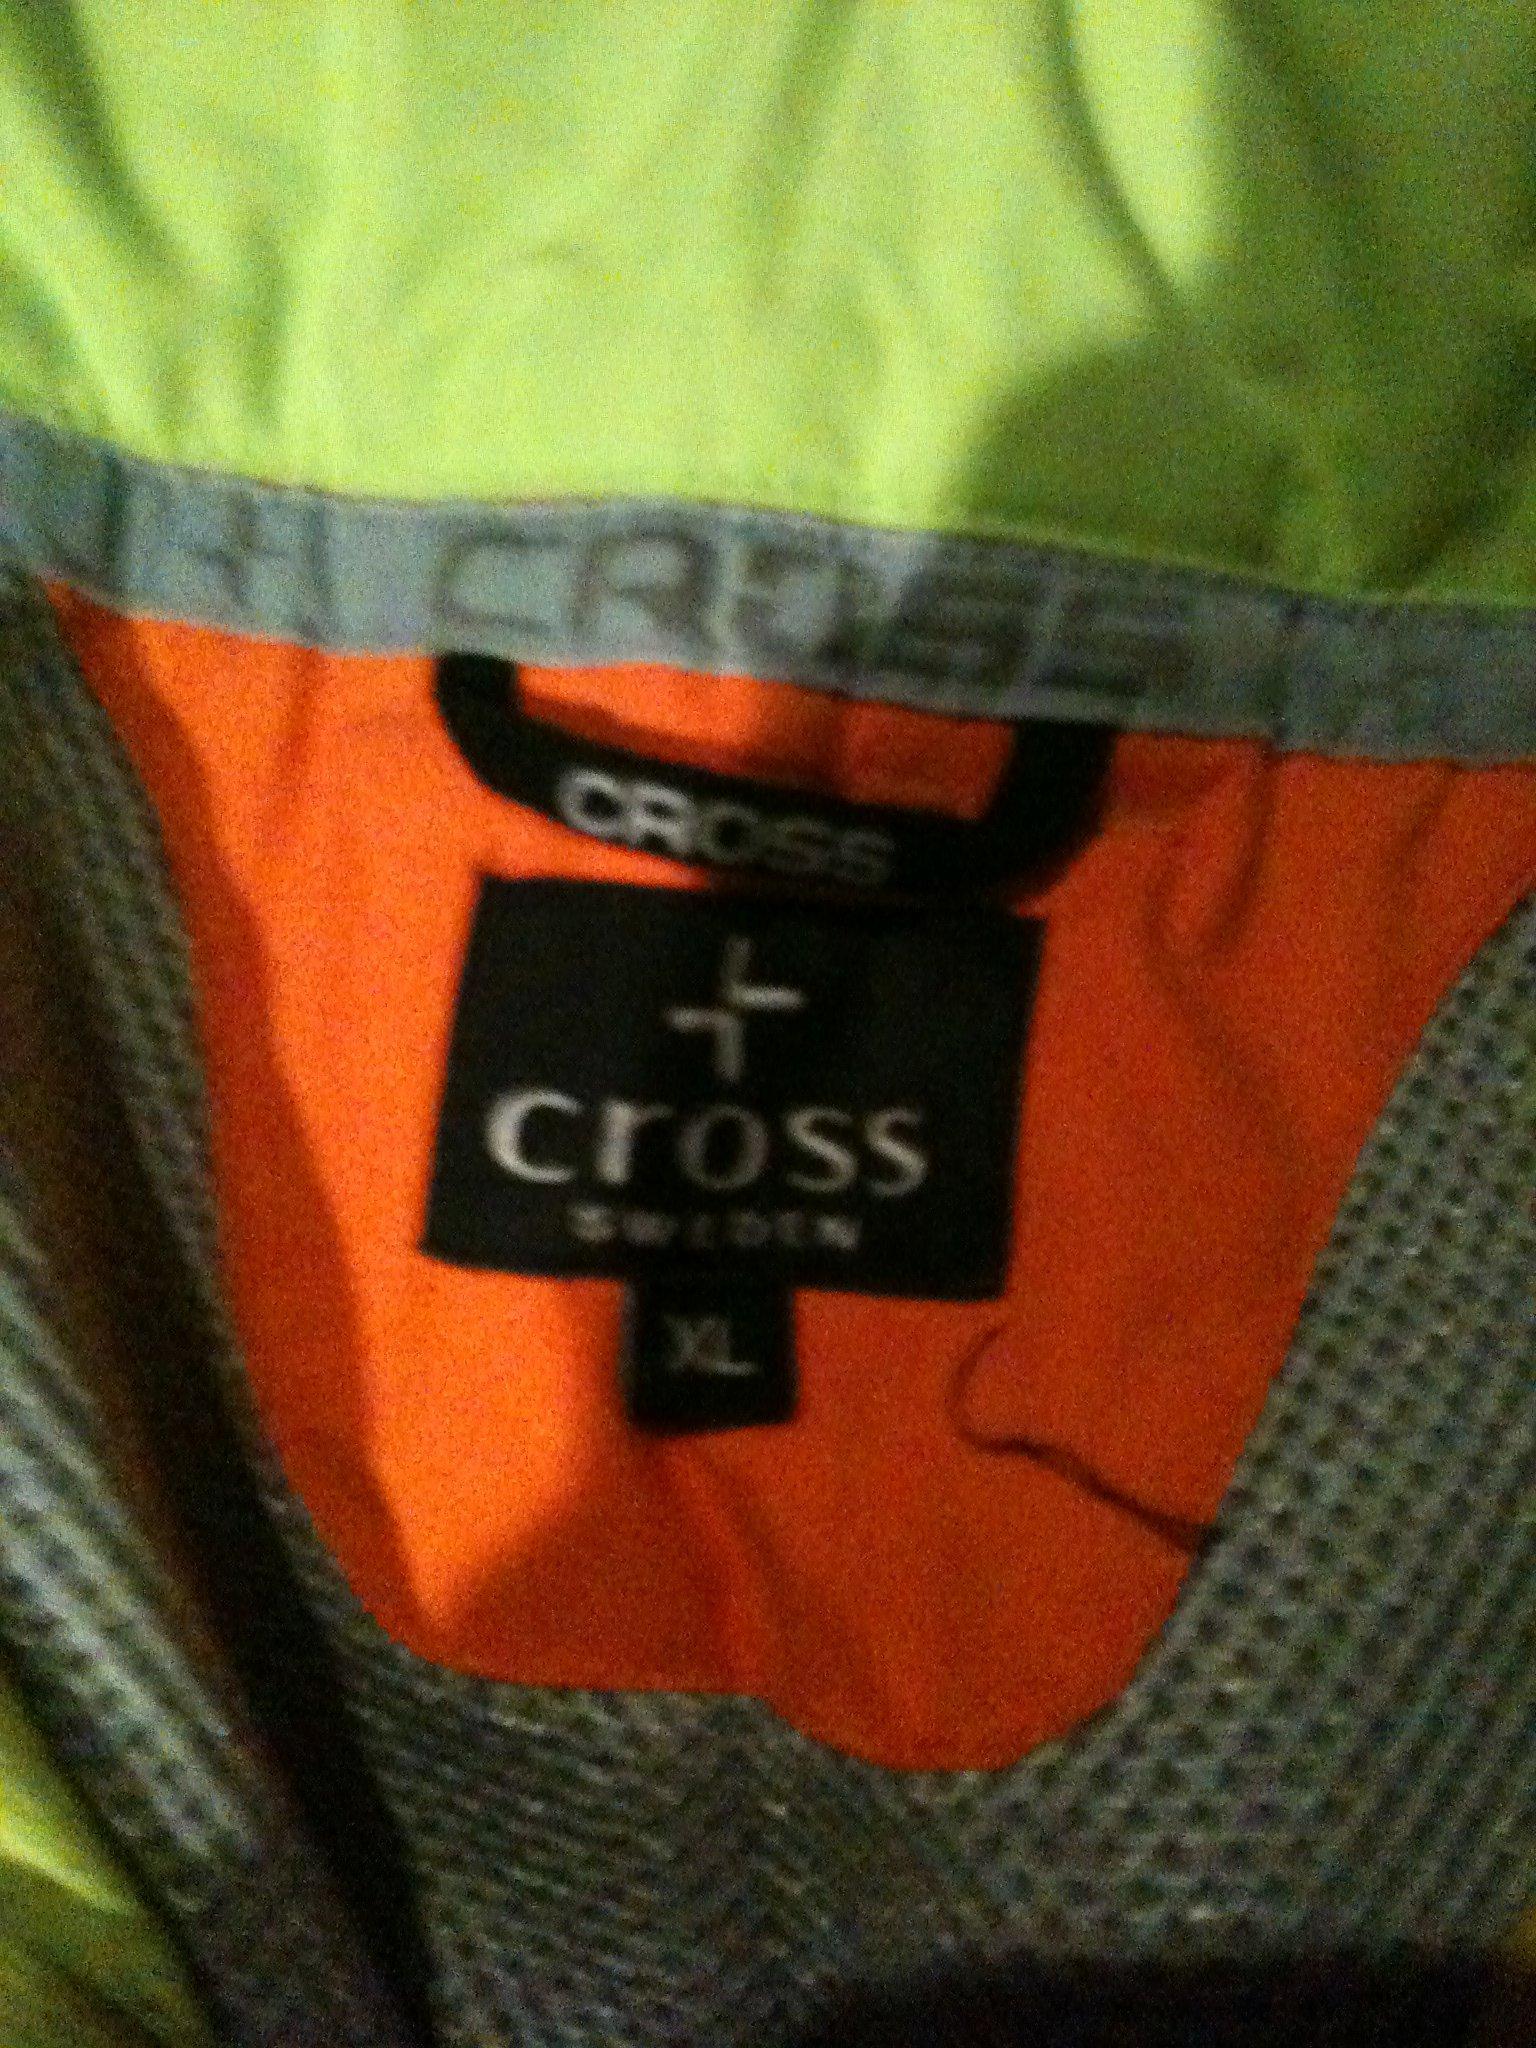 Cross Pants XL